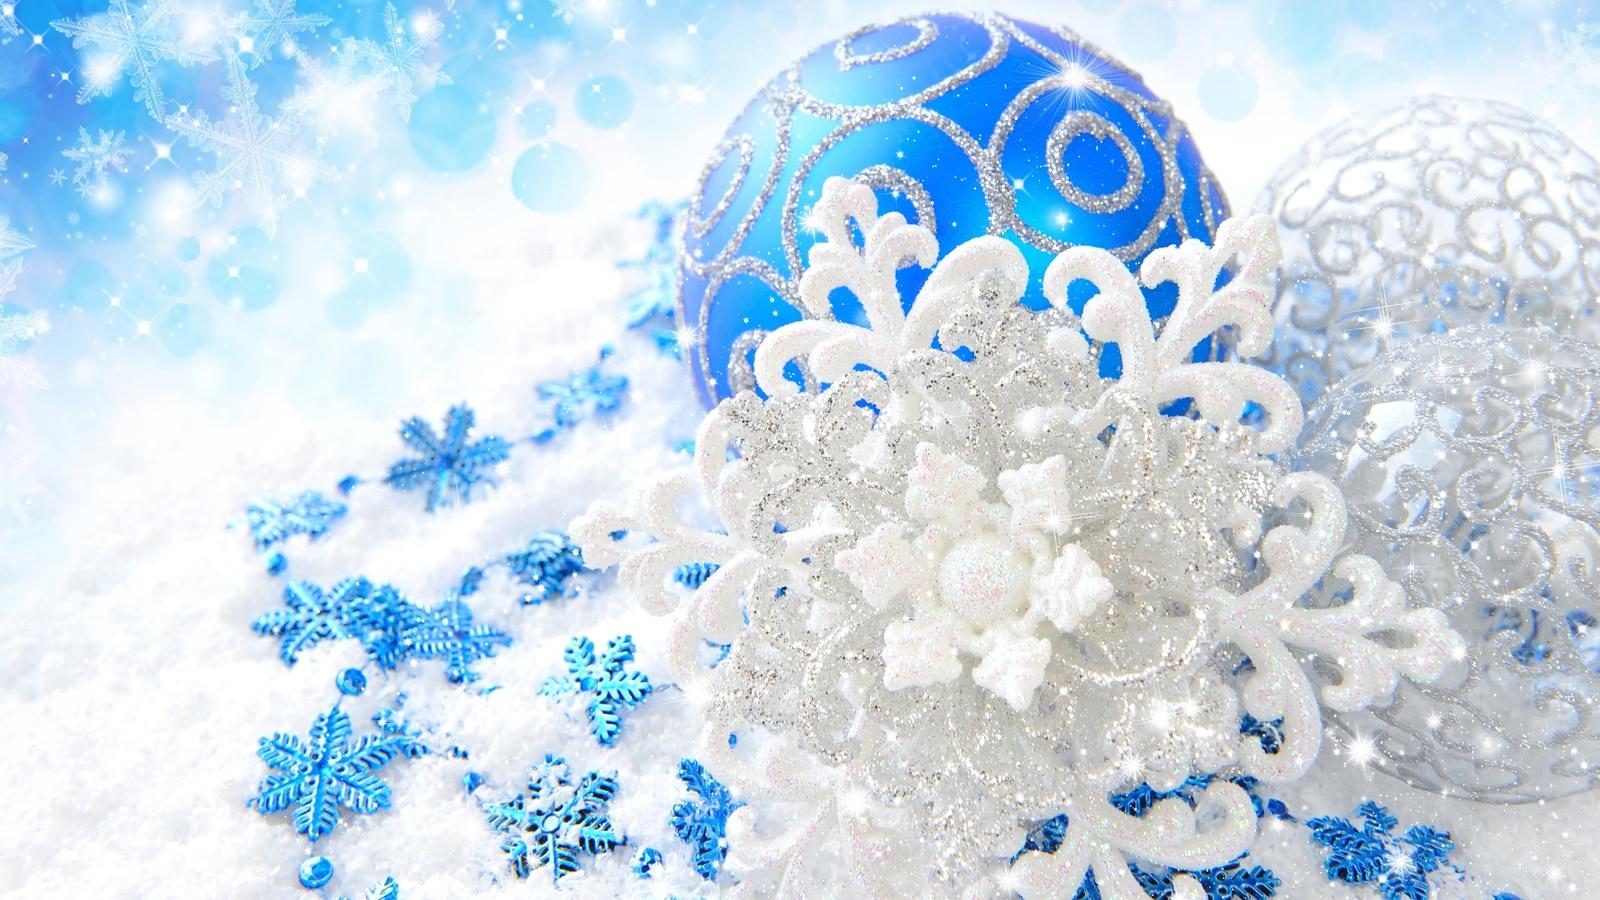 открытка зима снежинка задача для